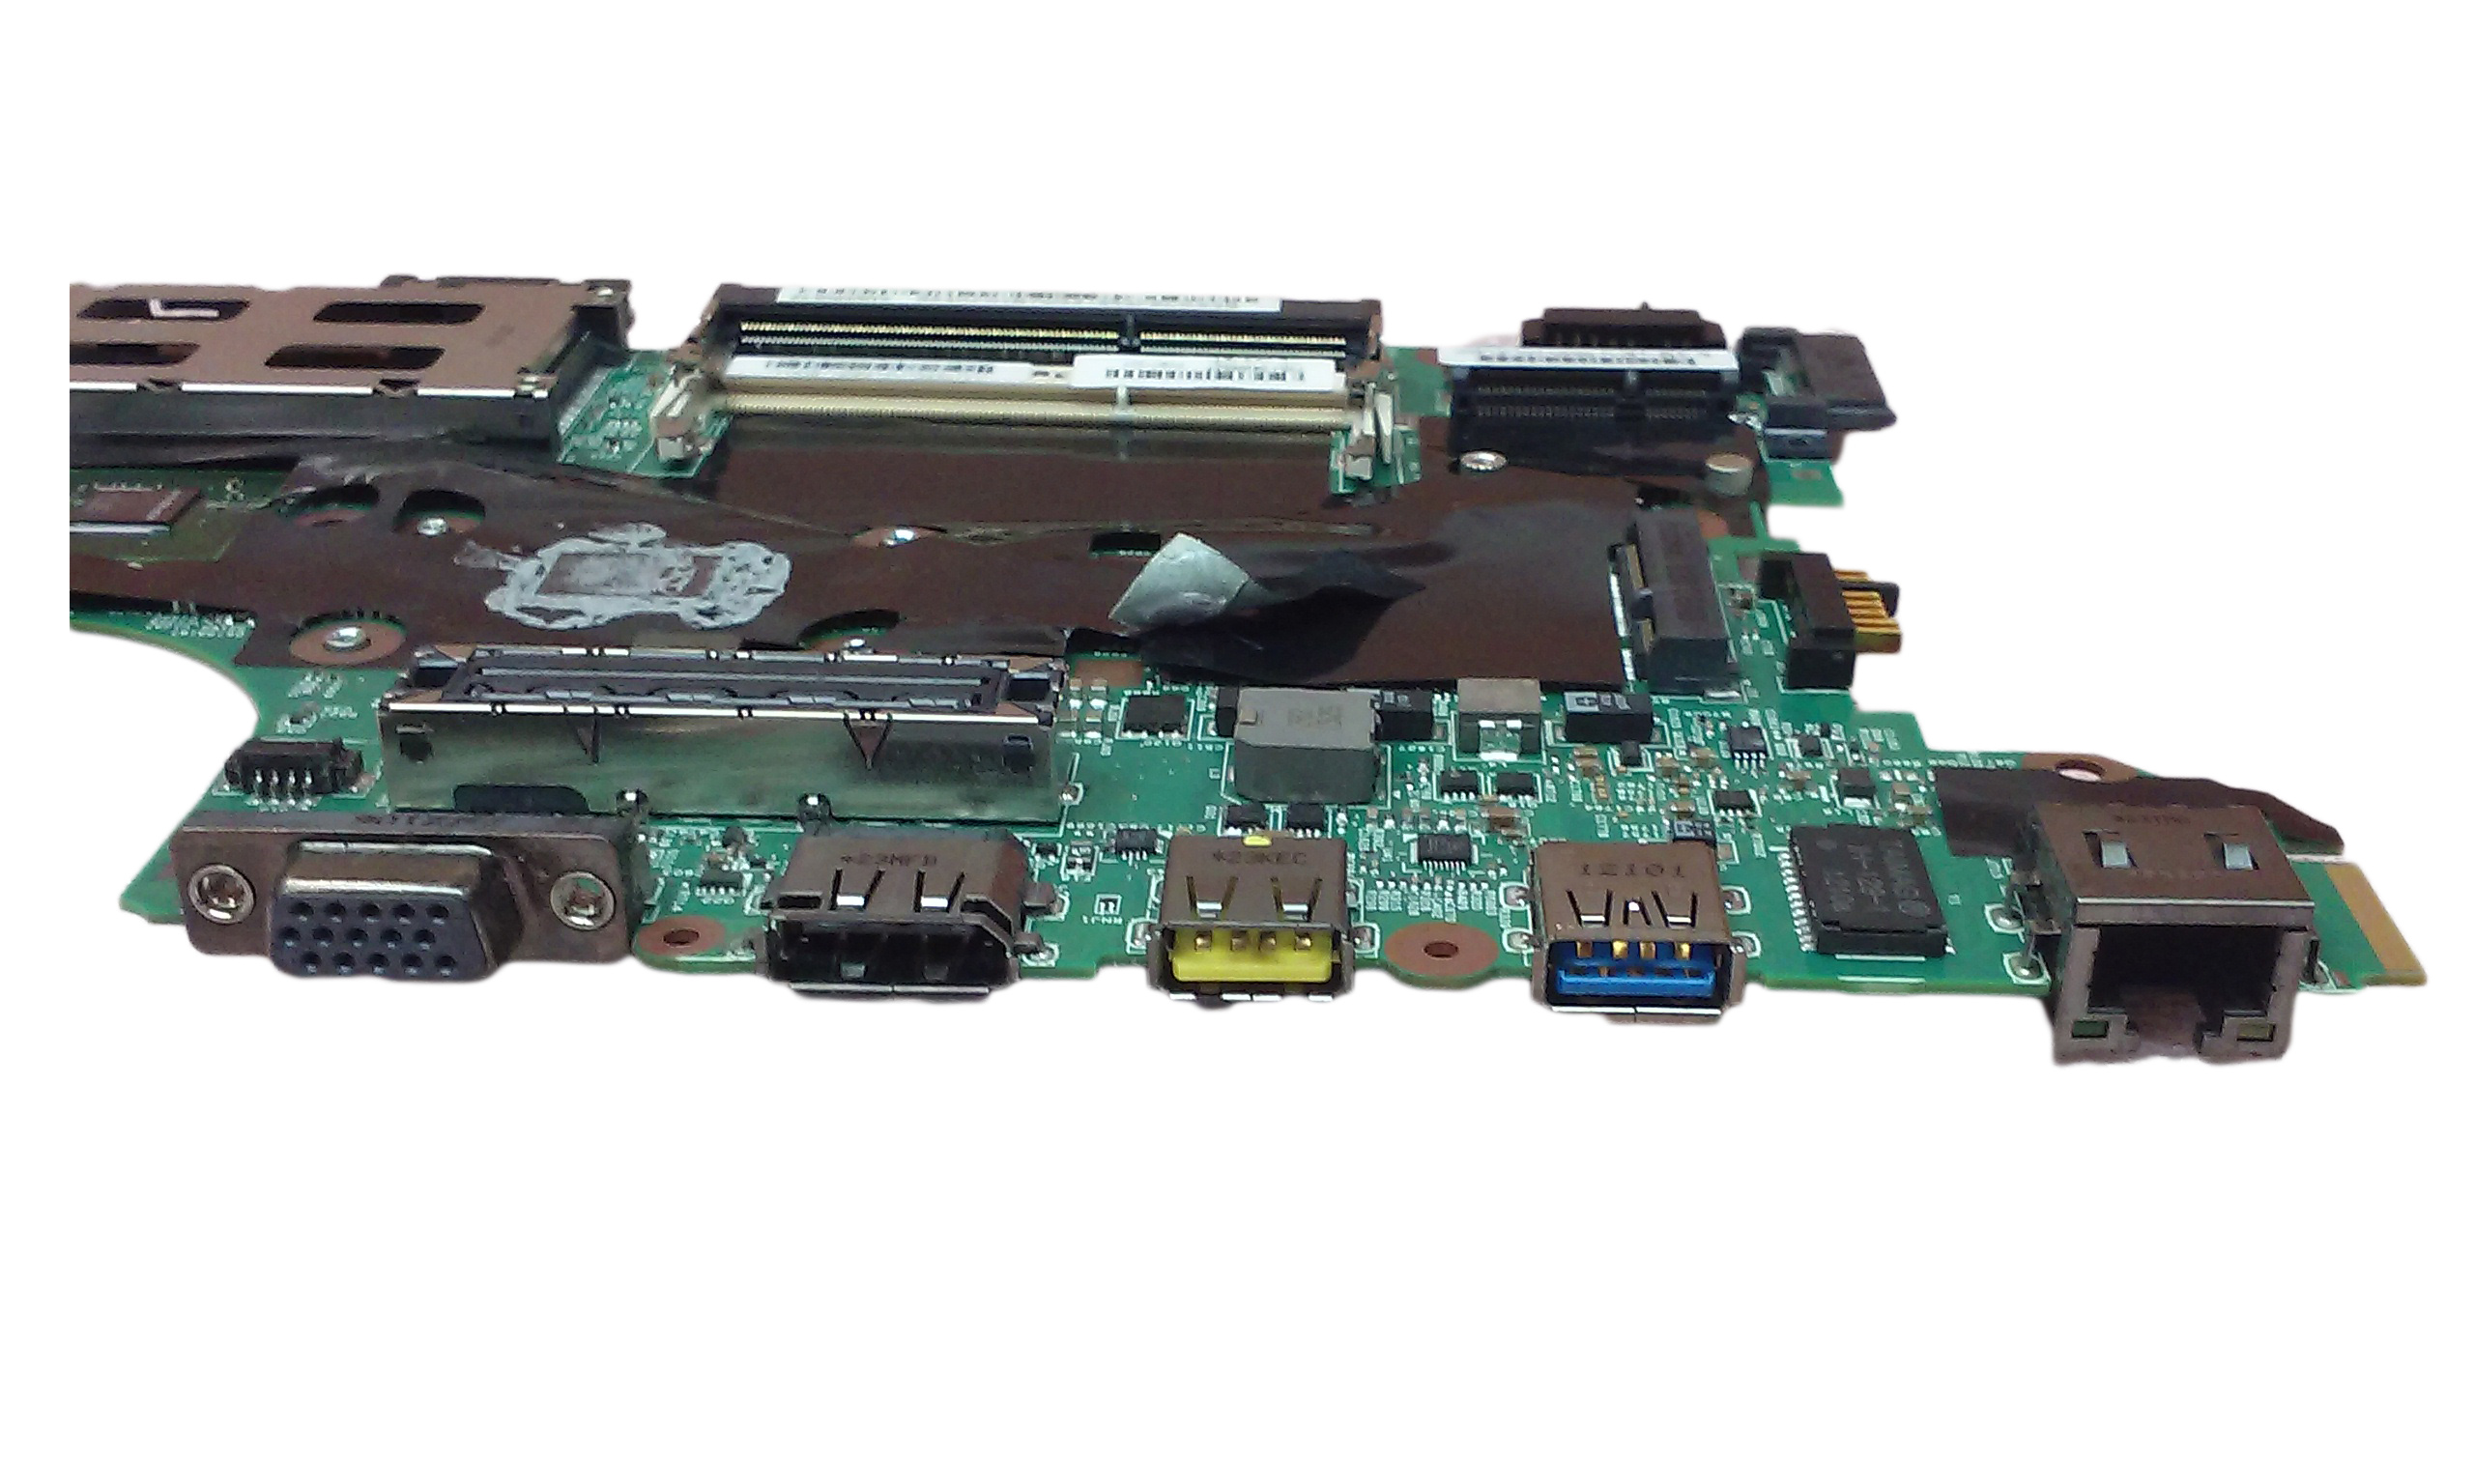 Refurbished Lenovo 04W6527 ThinkPad T420s Intel i7 2640m 2 8GHz Laptop  Motherboard